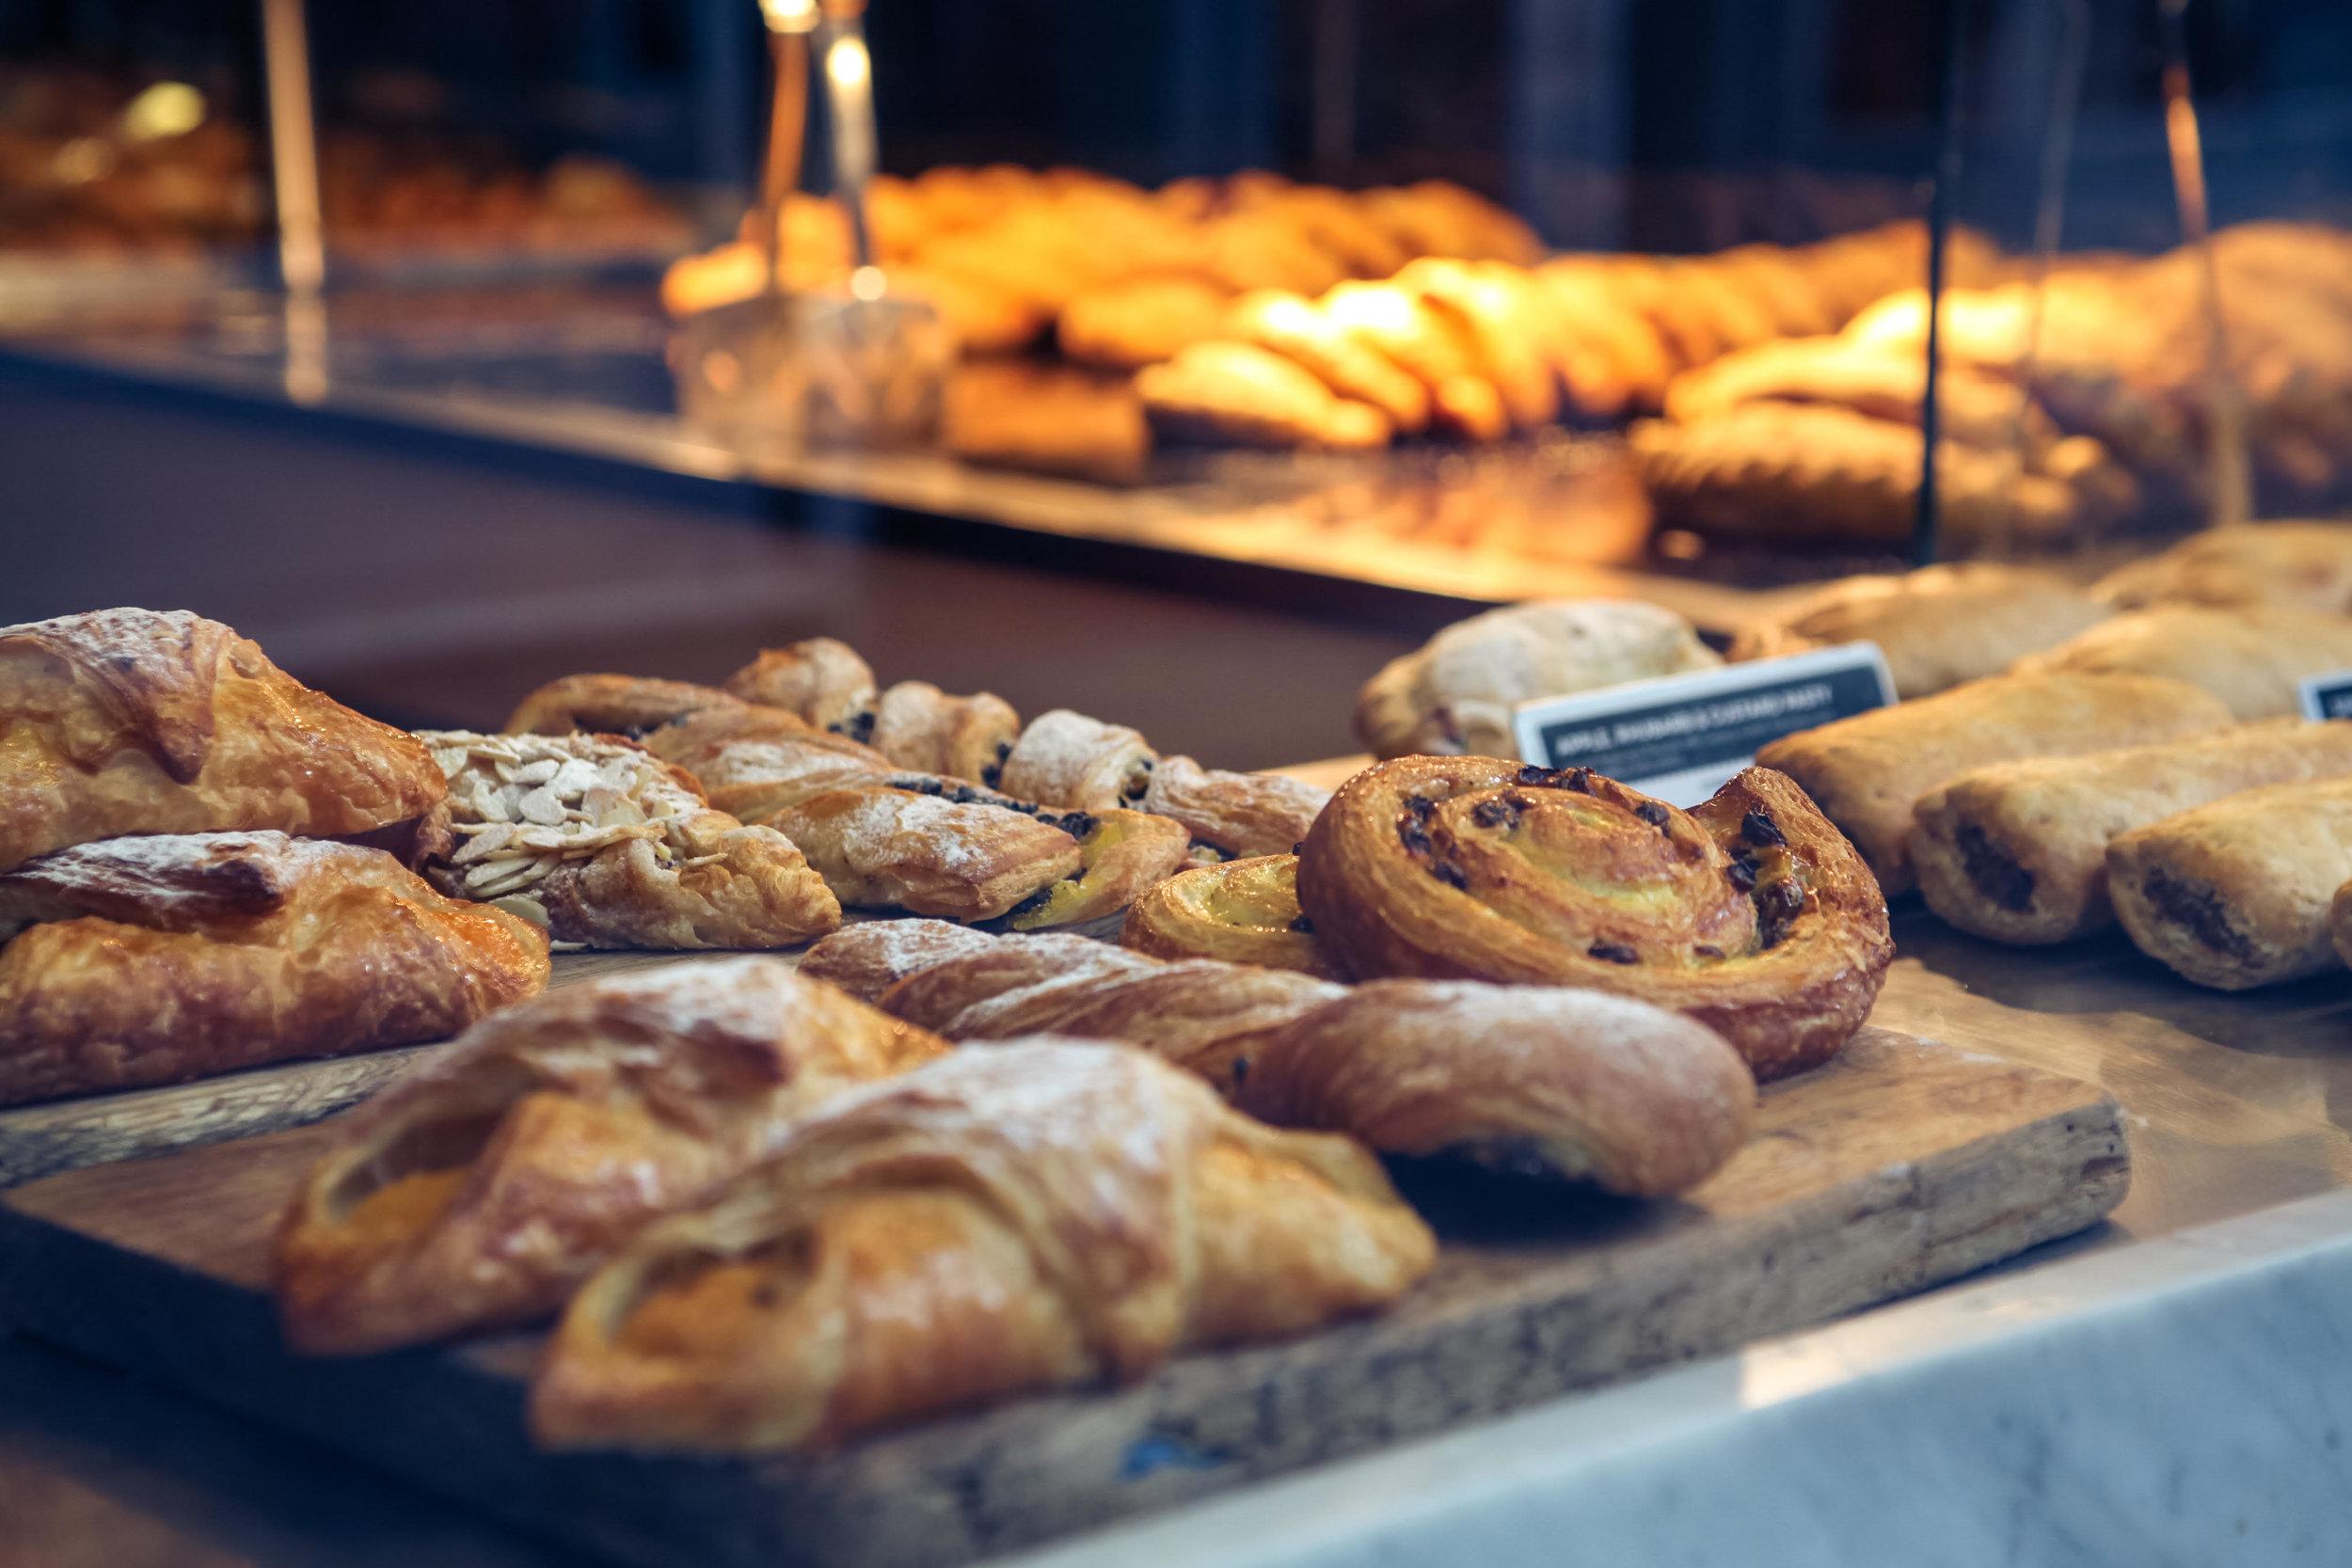 Saudi International Bakery & Pastry Expo - Riyadh, Saudi